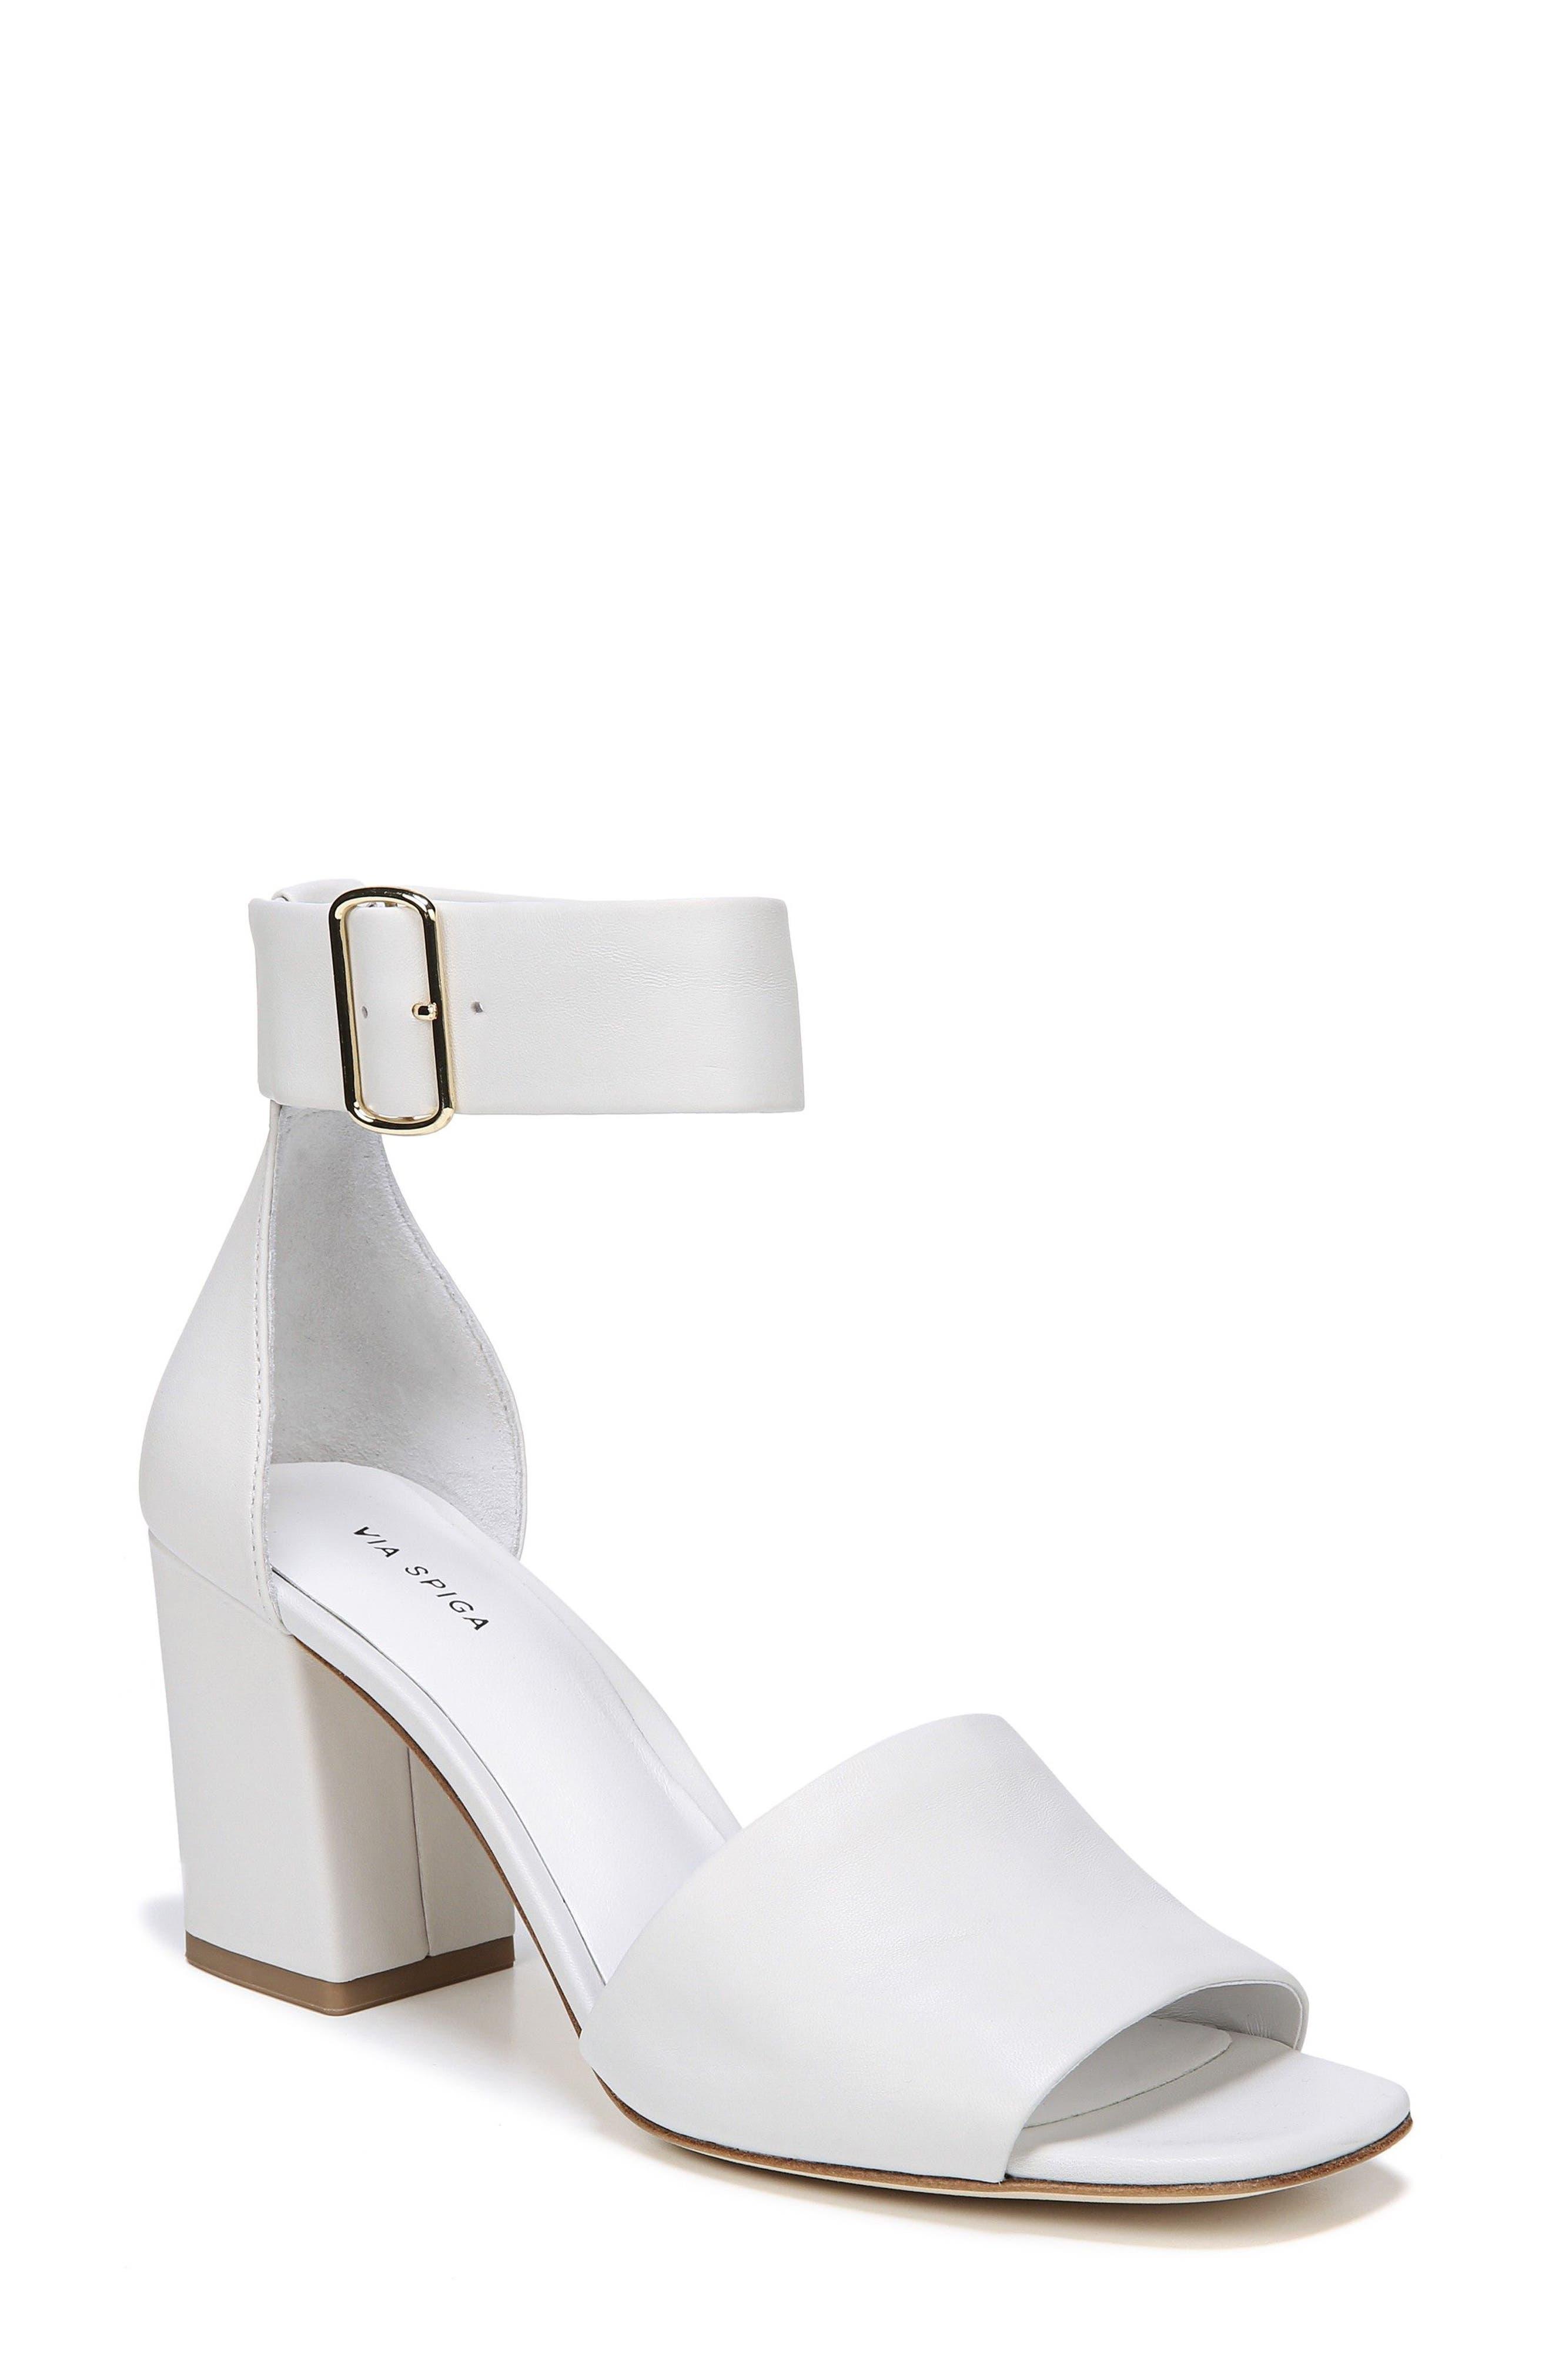 Evonne Ankle Strap Sandal,                             Main thumbnail 1, color,                             Porcelain Leather